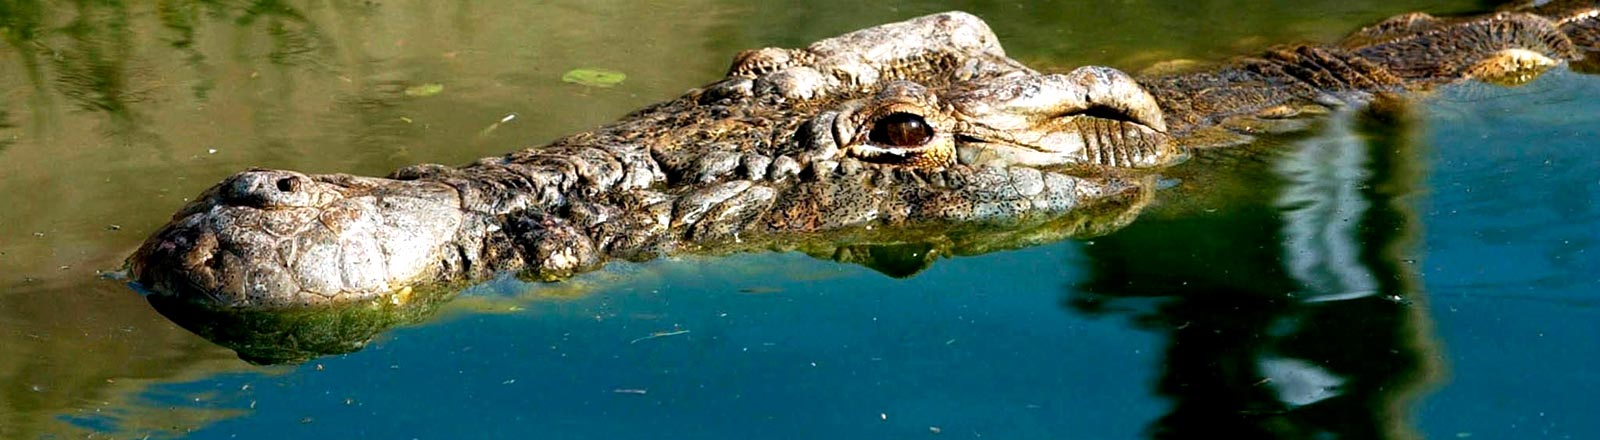 Ein Krokodil namens Osama aus Uganda.